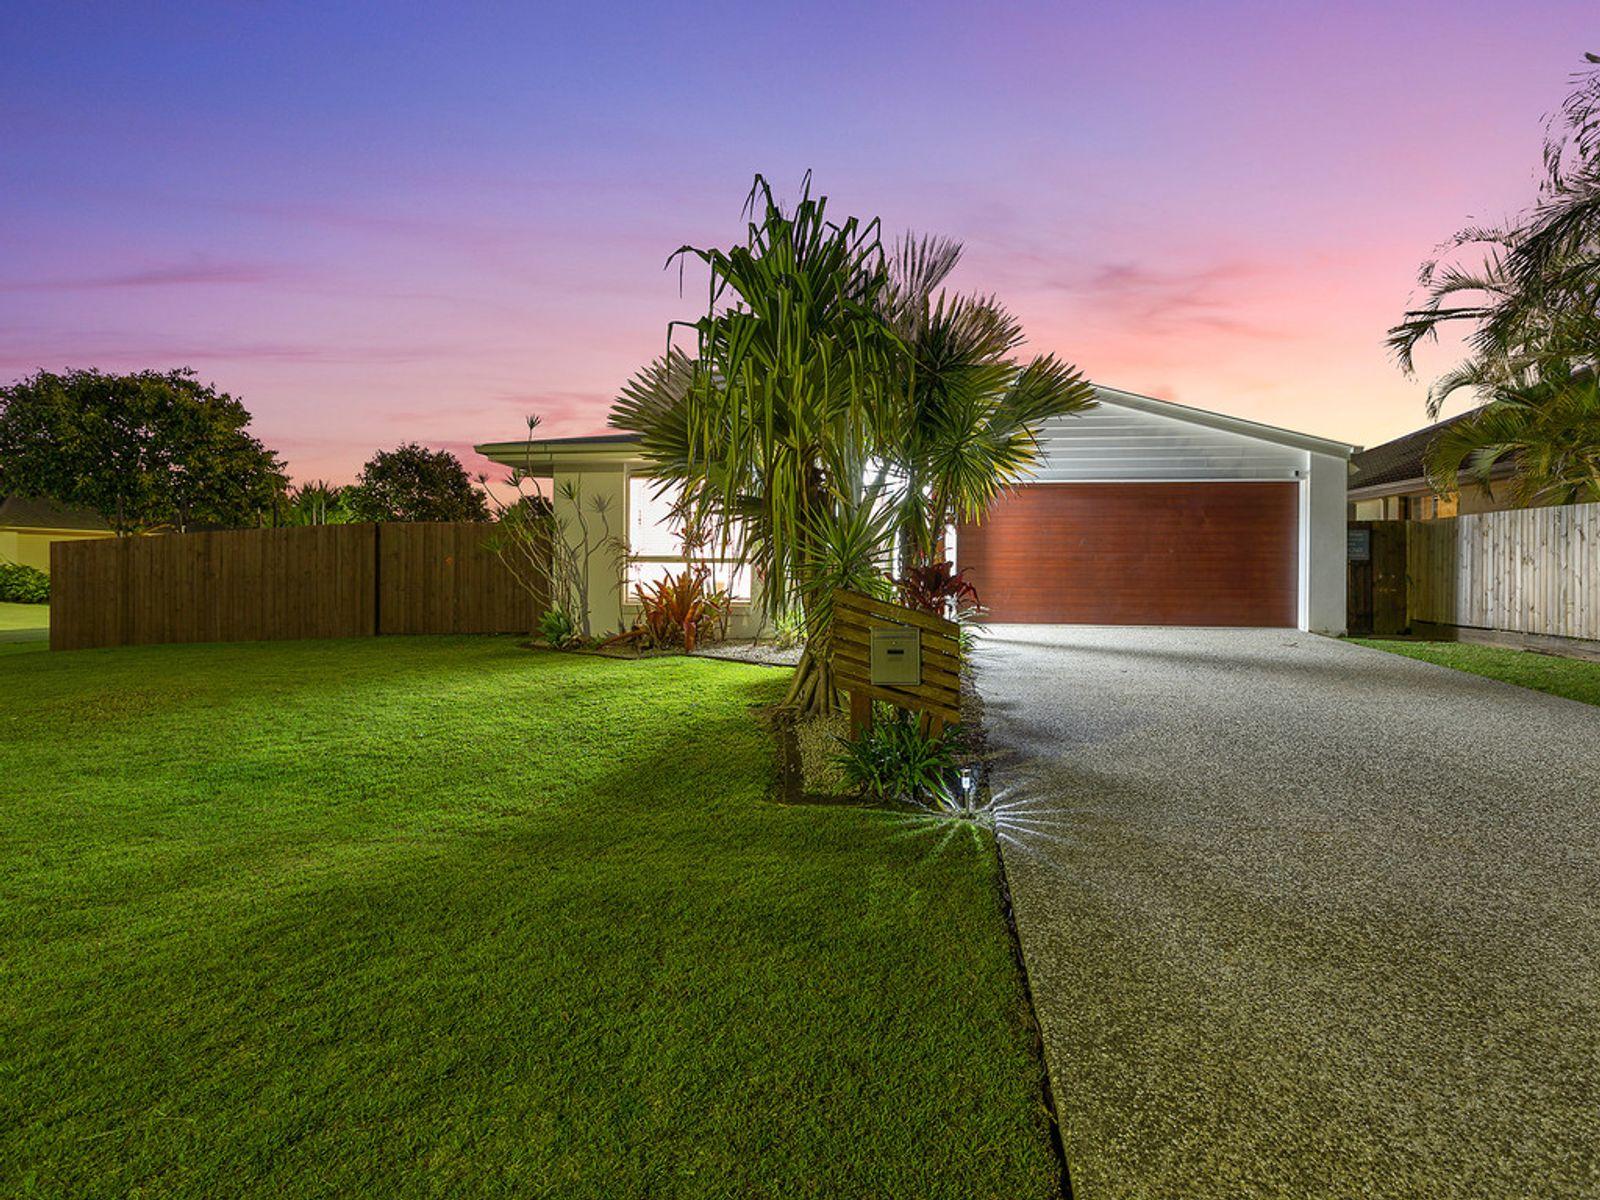 17 Mingus Street, Sippy Downs, QLD 4556